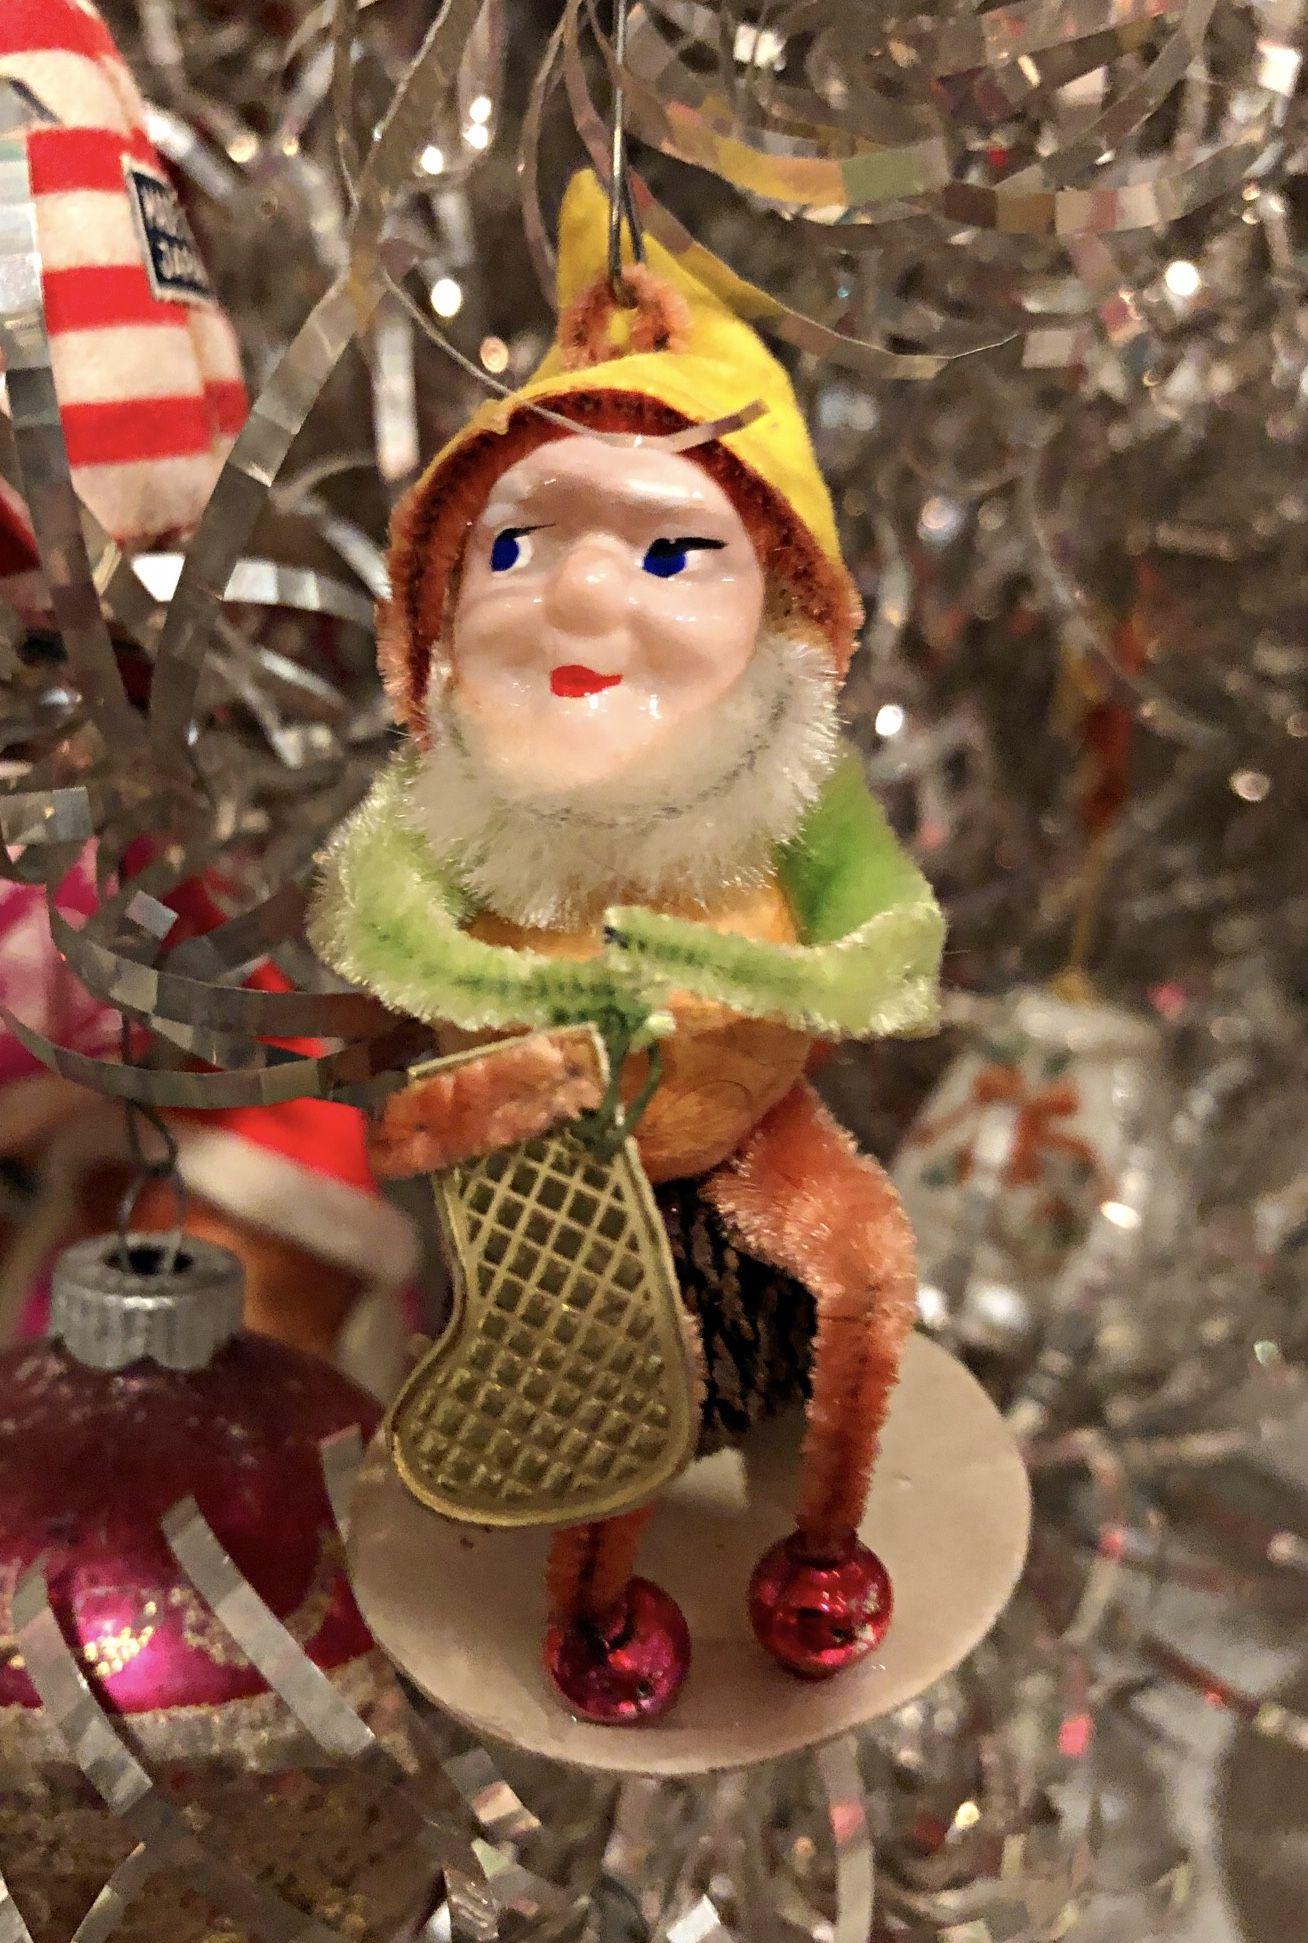 1950s Elf Gnome Ornament Vintage Christmas Retro Christmas Vintage Christmas Ornaments